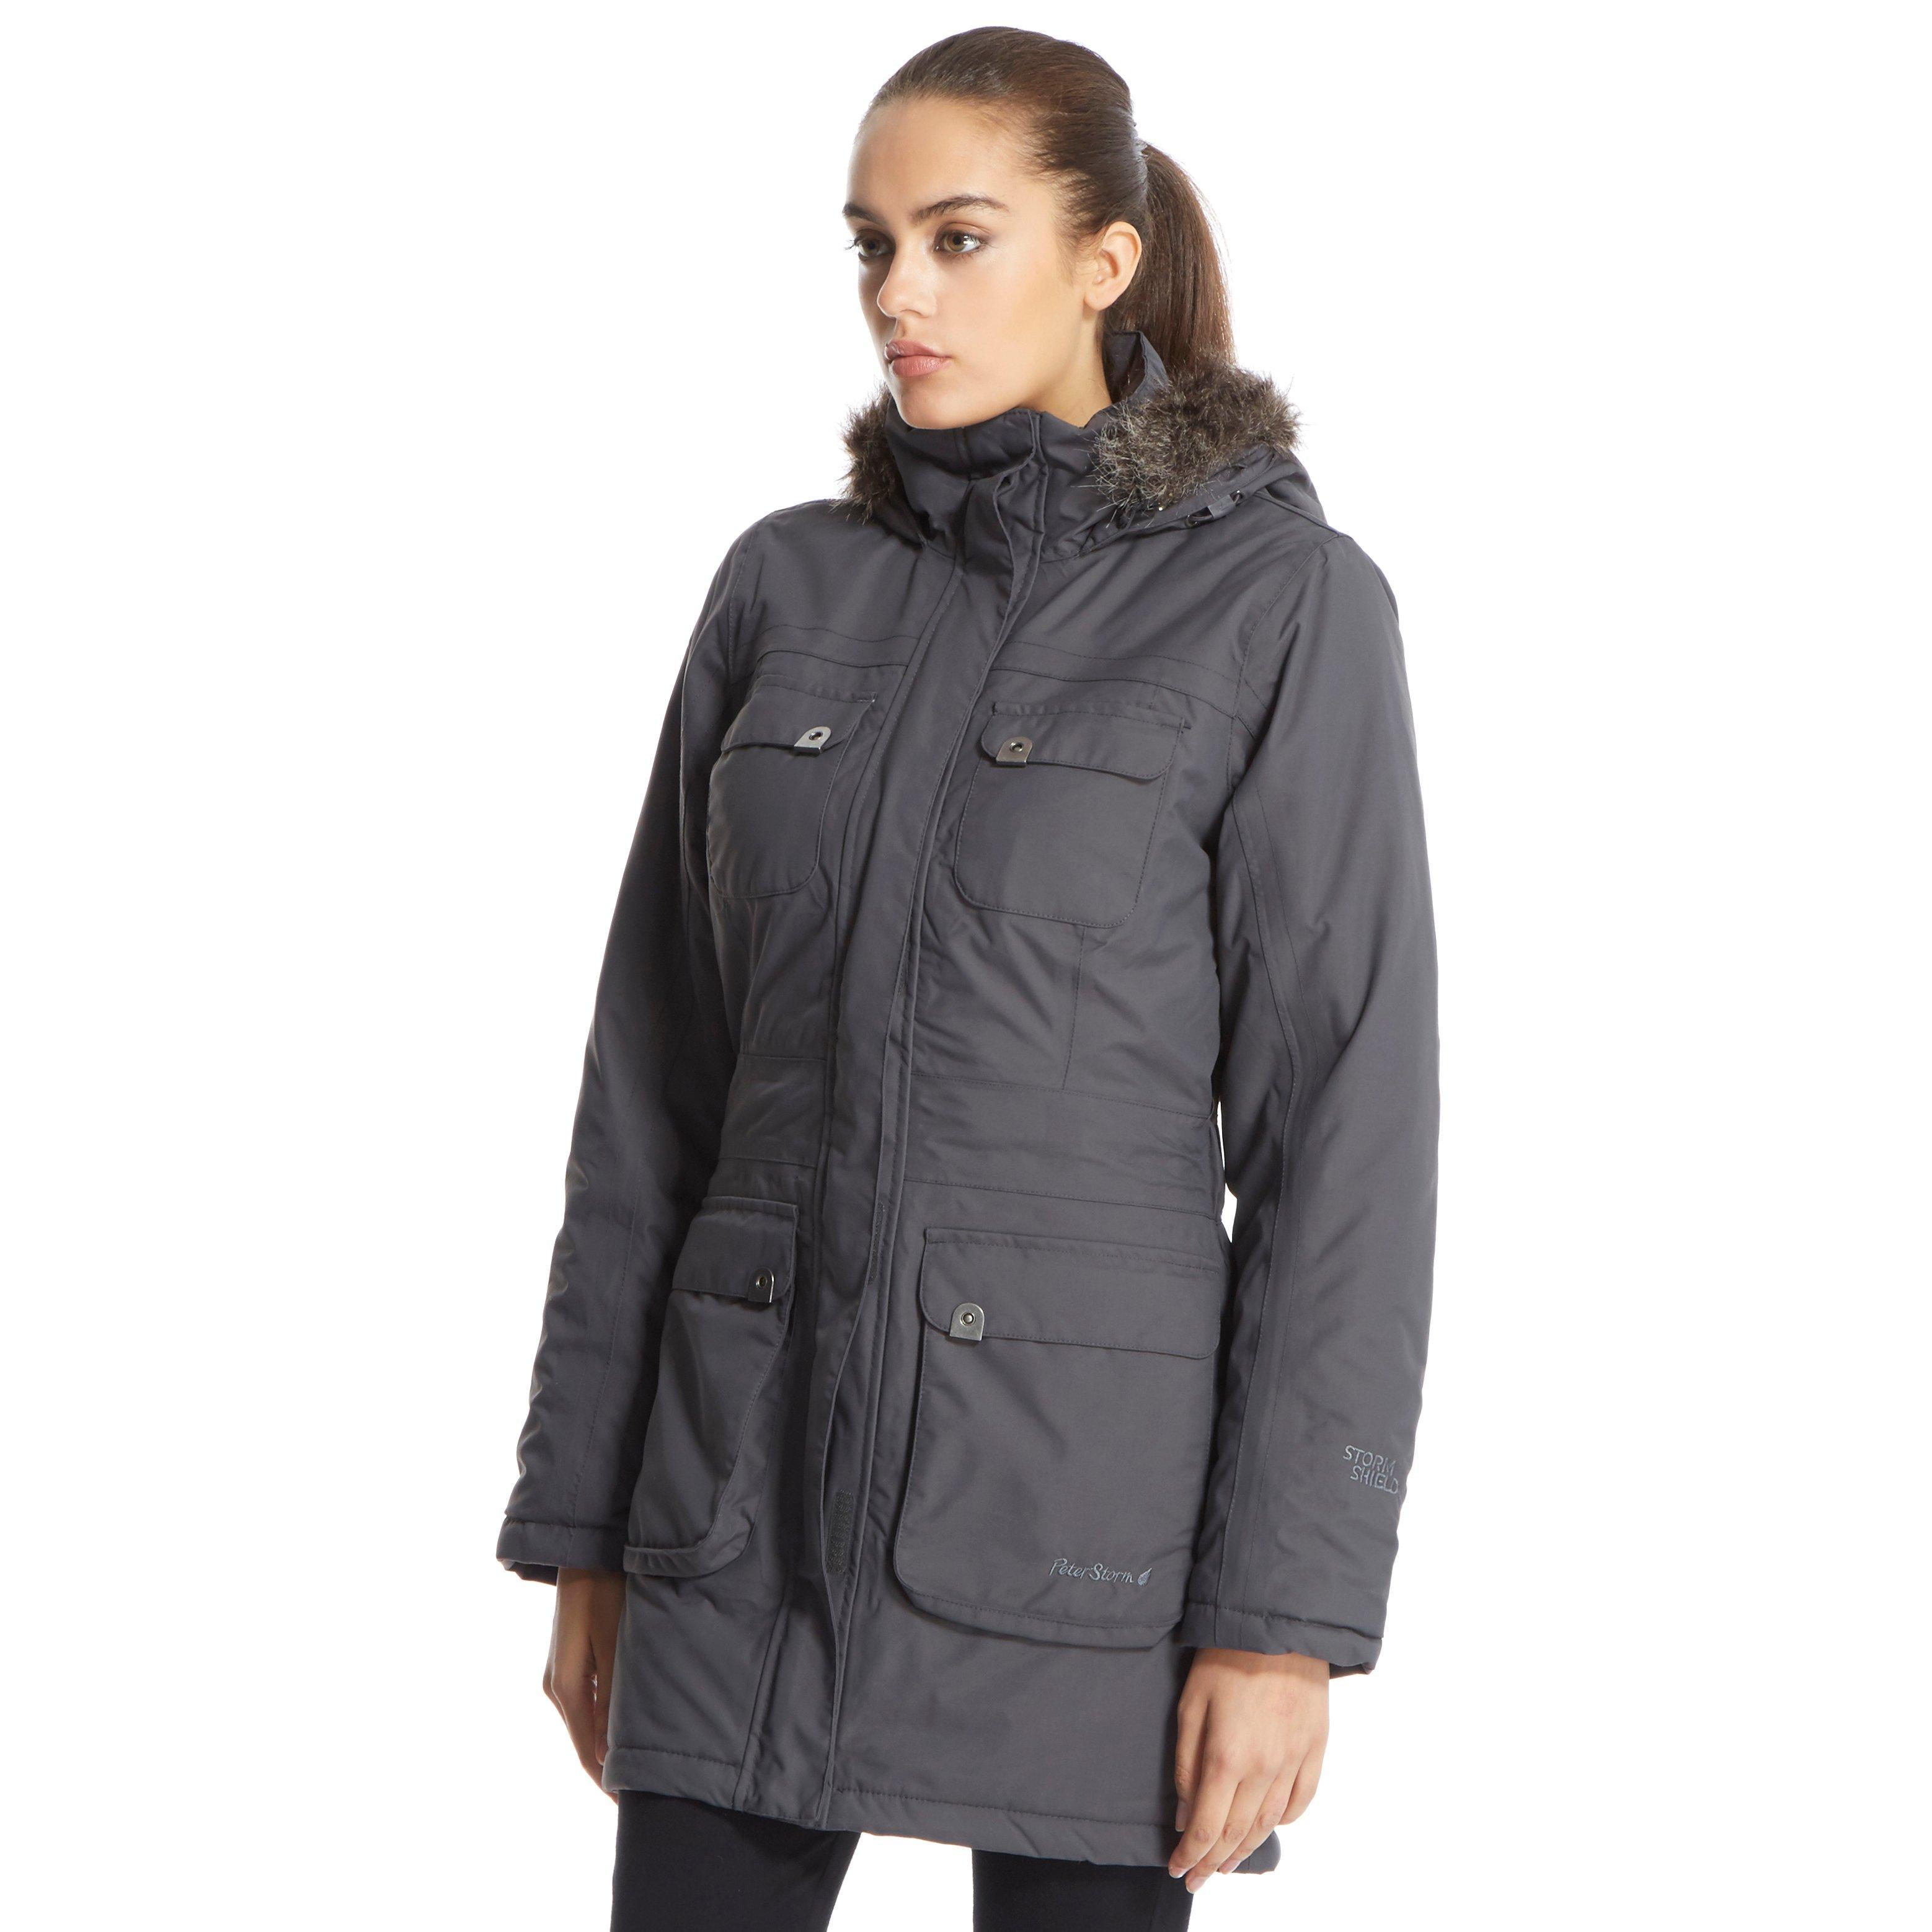 Grey Parka Jacket Womens Jacket To